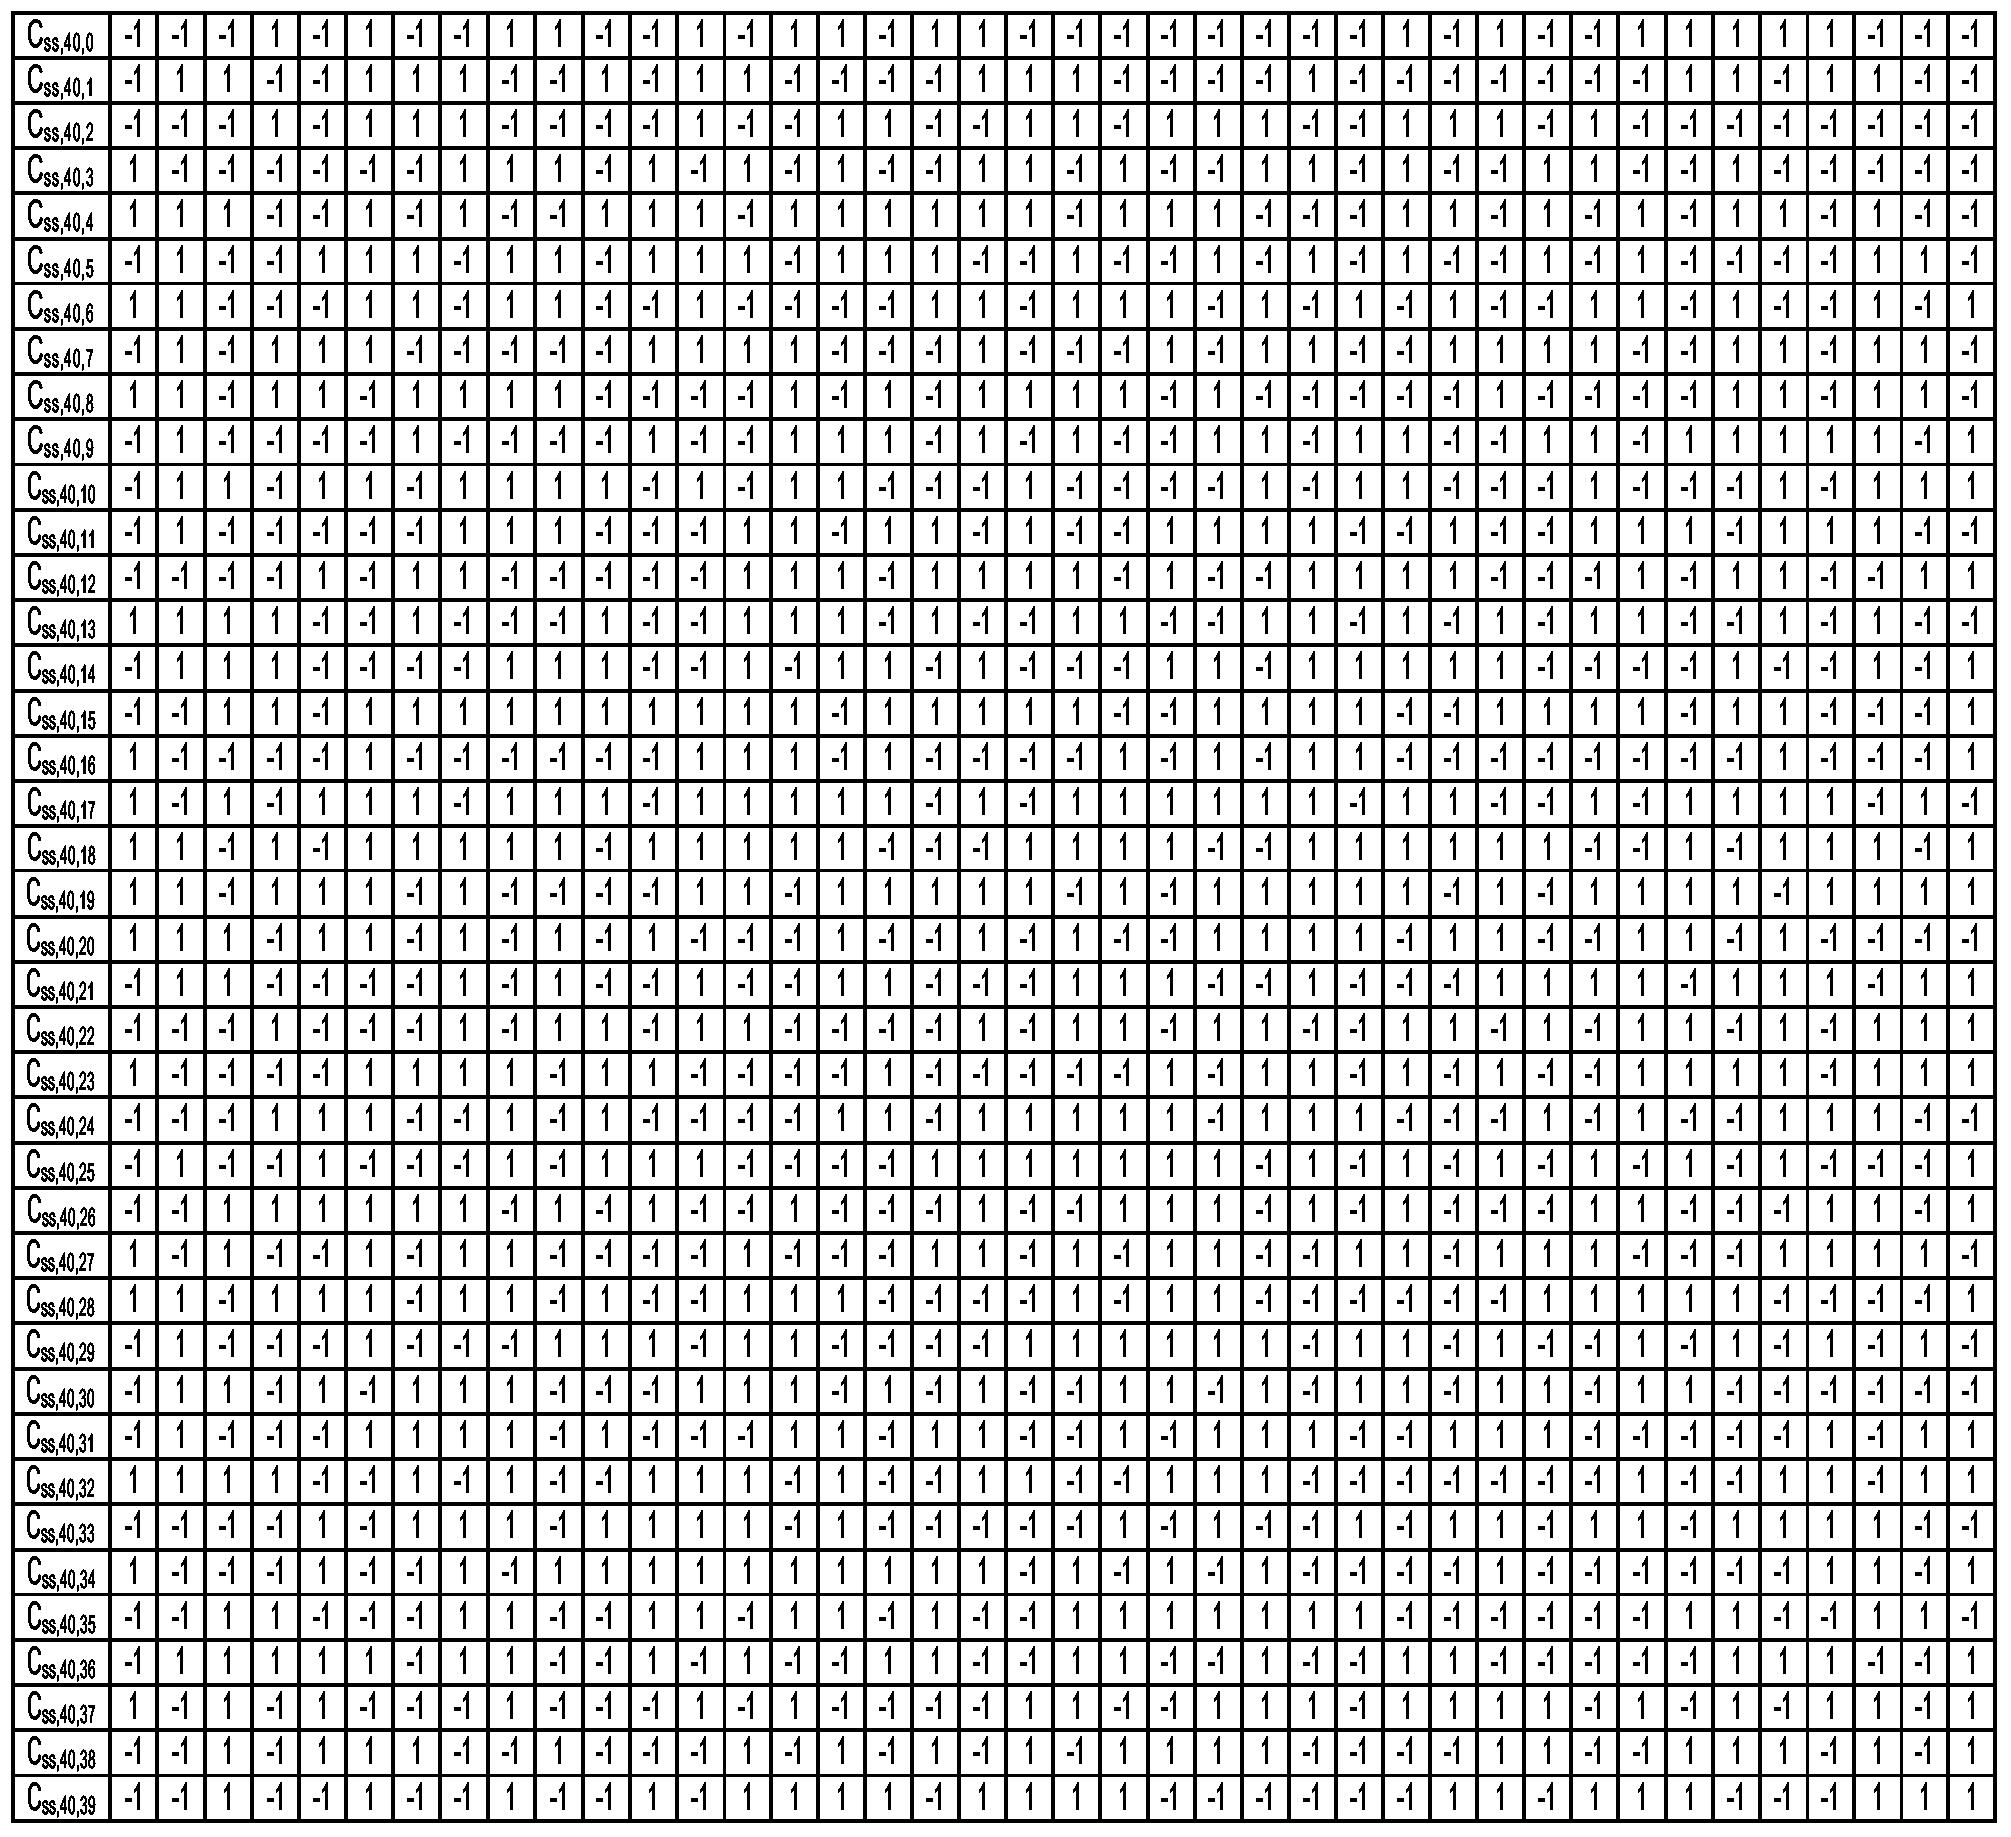 Pin 40 X 40 Multiplication Table Http Www Ebay Co Uk Itm Mini Poster ...